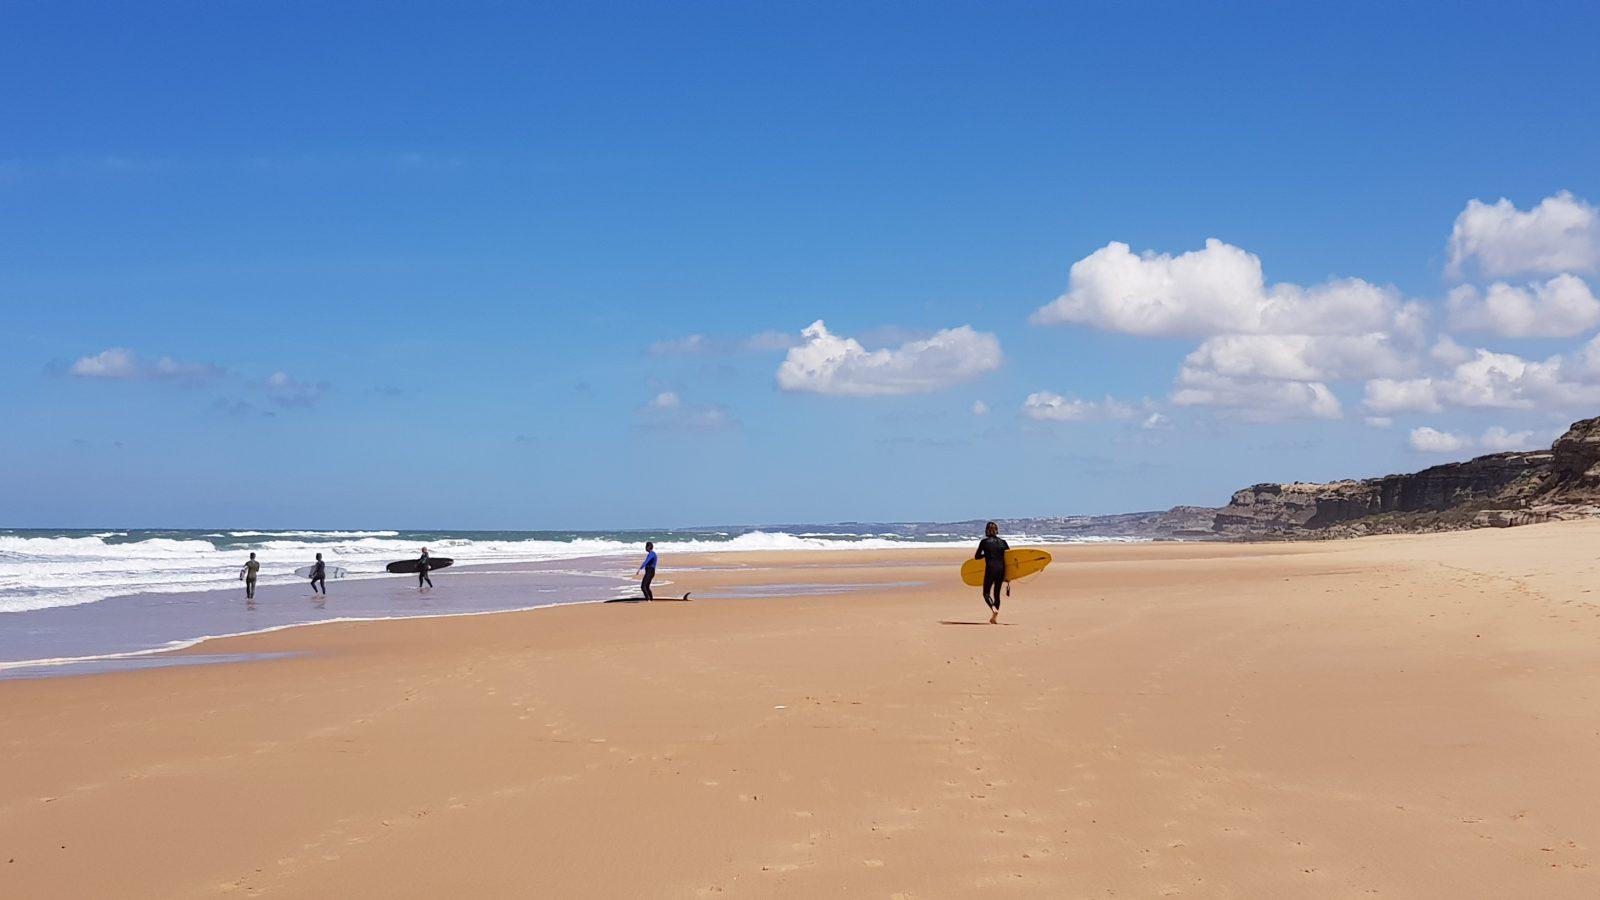 beach ocean surfing surfboards longboards waves